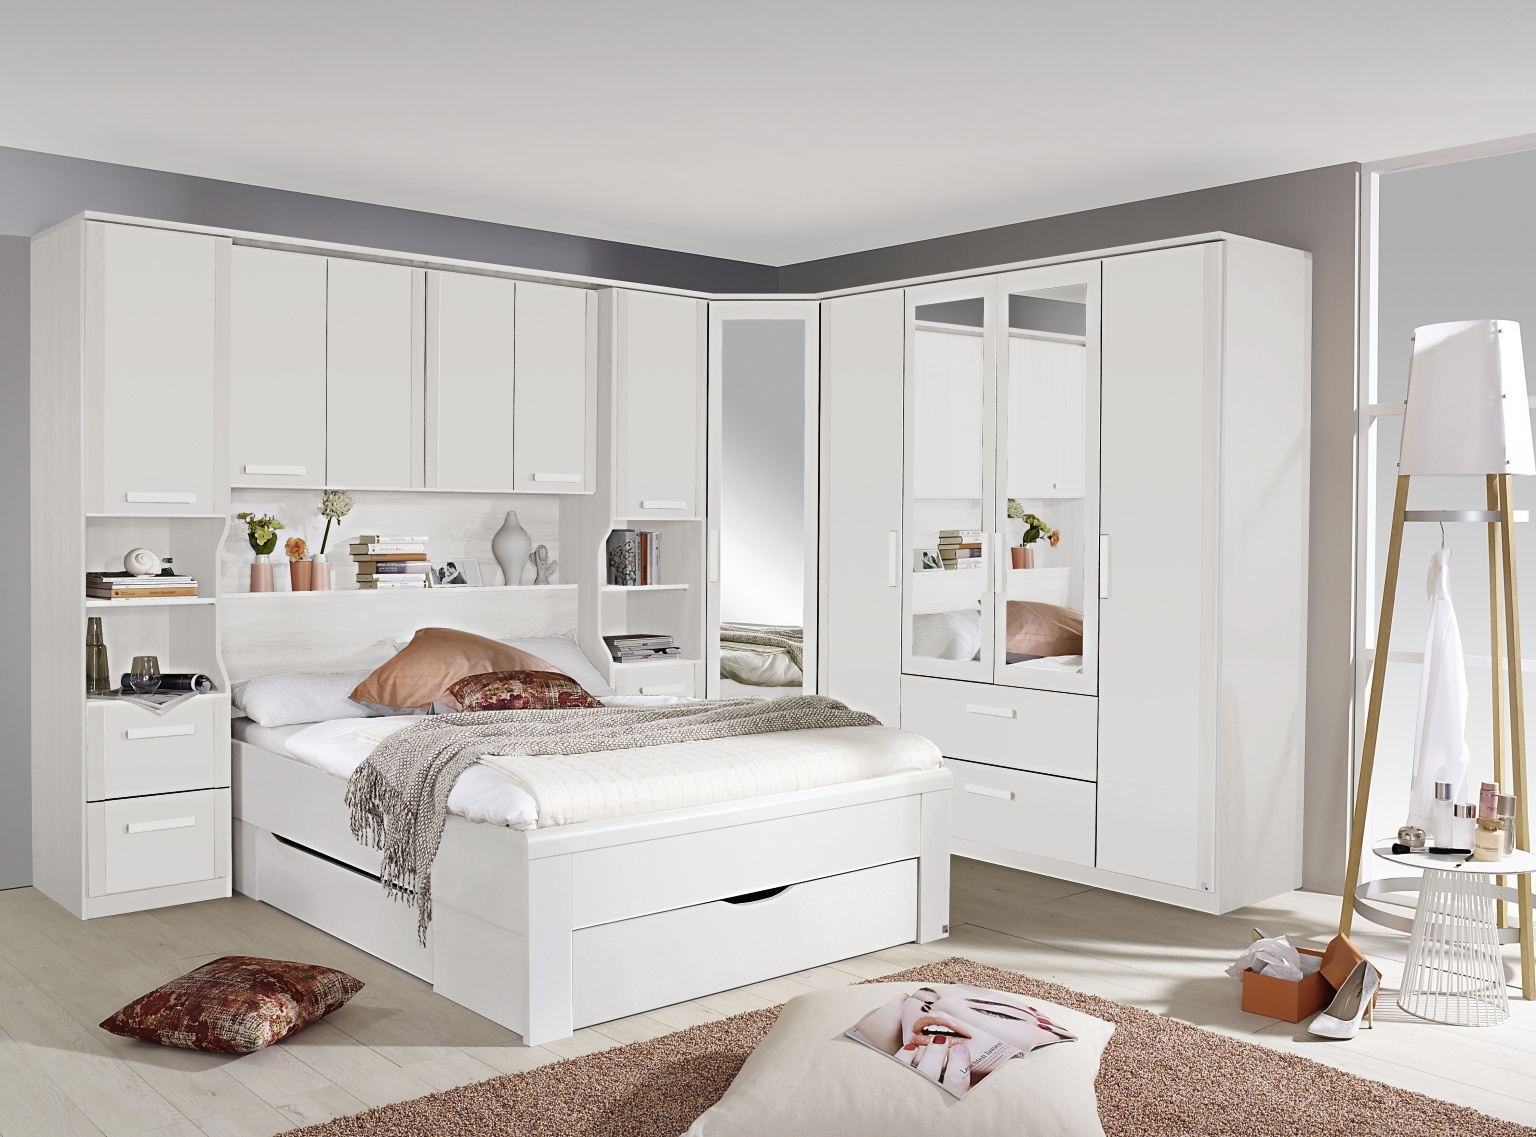 Rauch Rivera Alpine White 2 Door Corner Wardrobe with Cornice - W 137cm